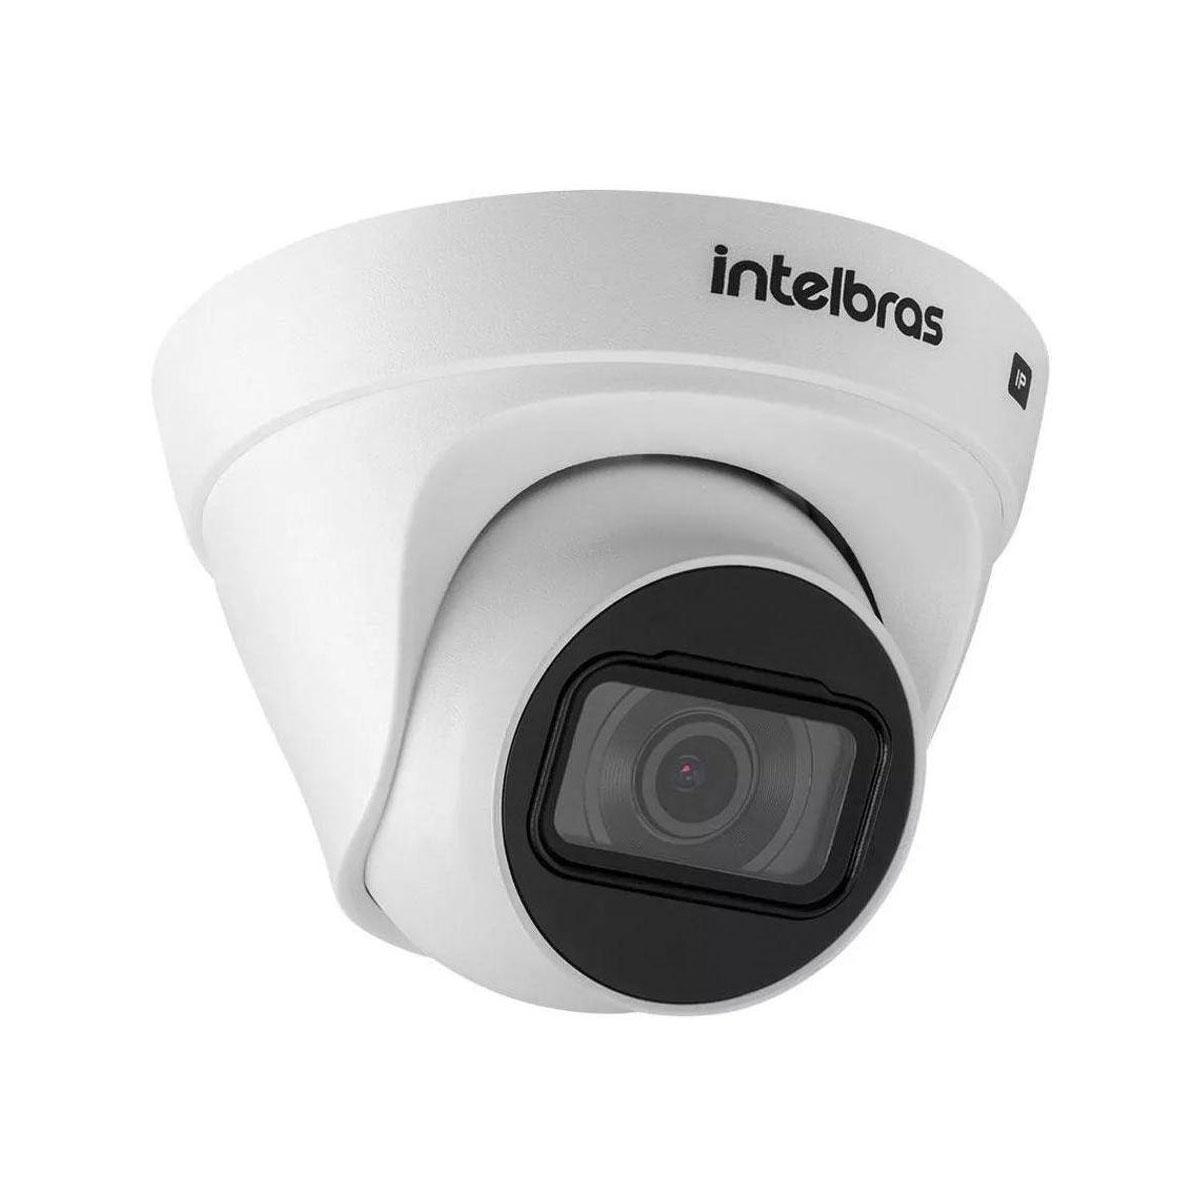 Câmera IP Intelbras VIP 1230 D Full HD 1080p PoE 2MP Dome Infravermelho 30 Metros